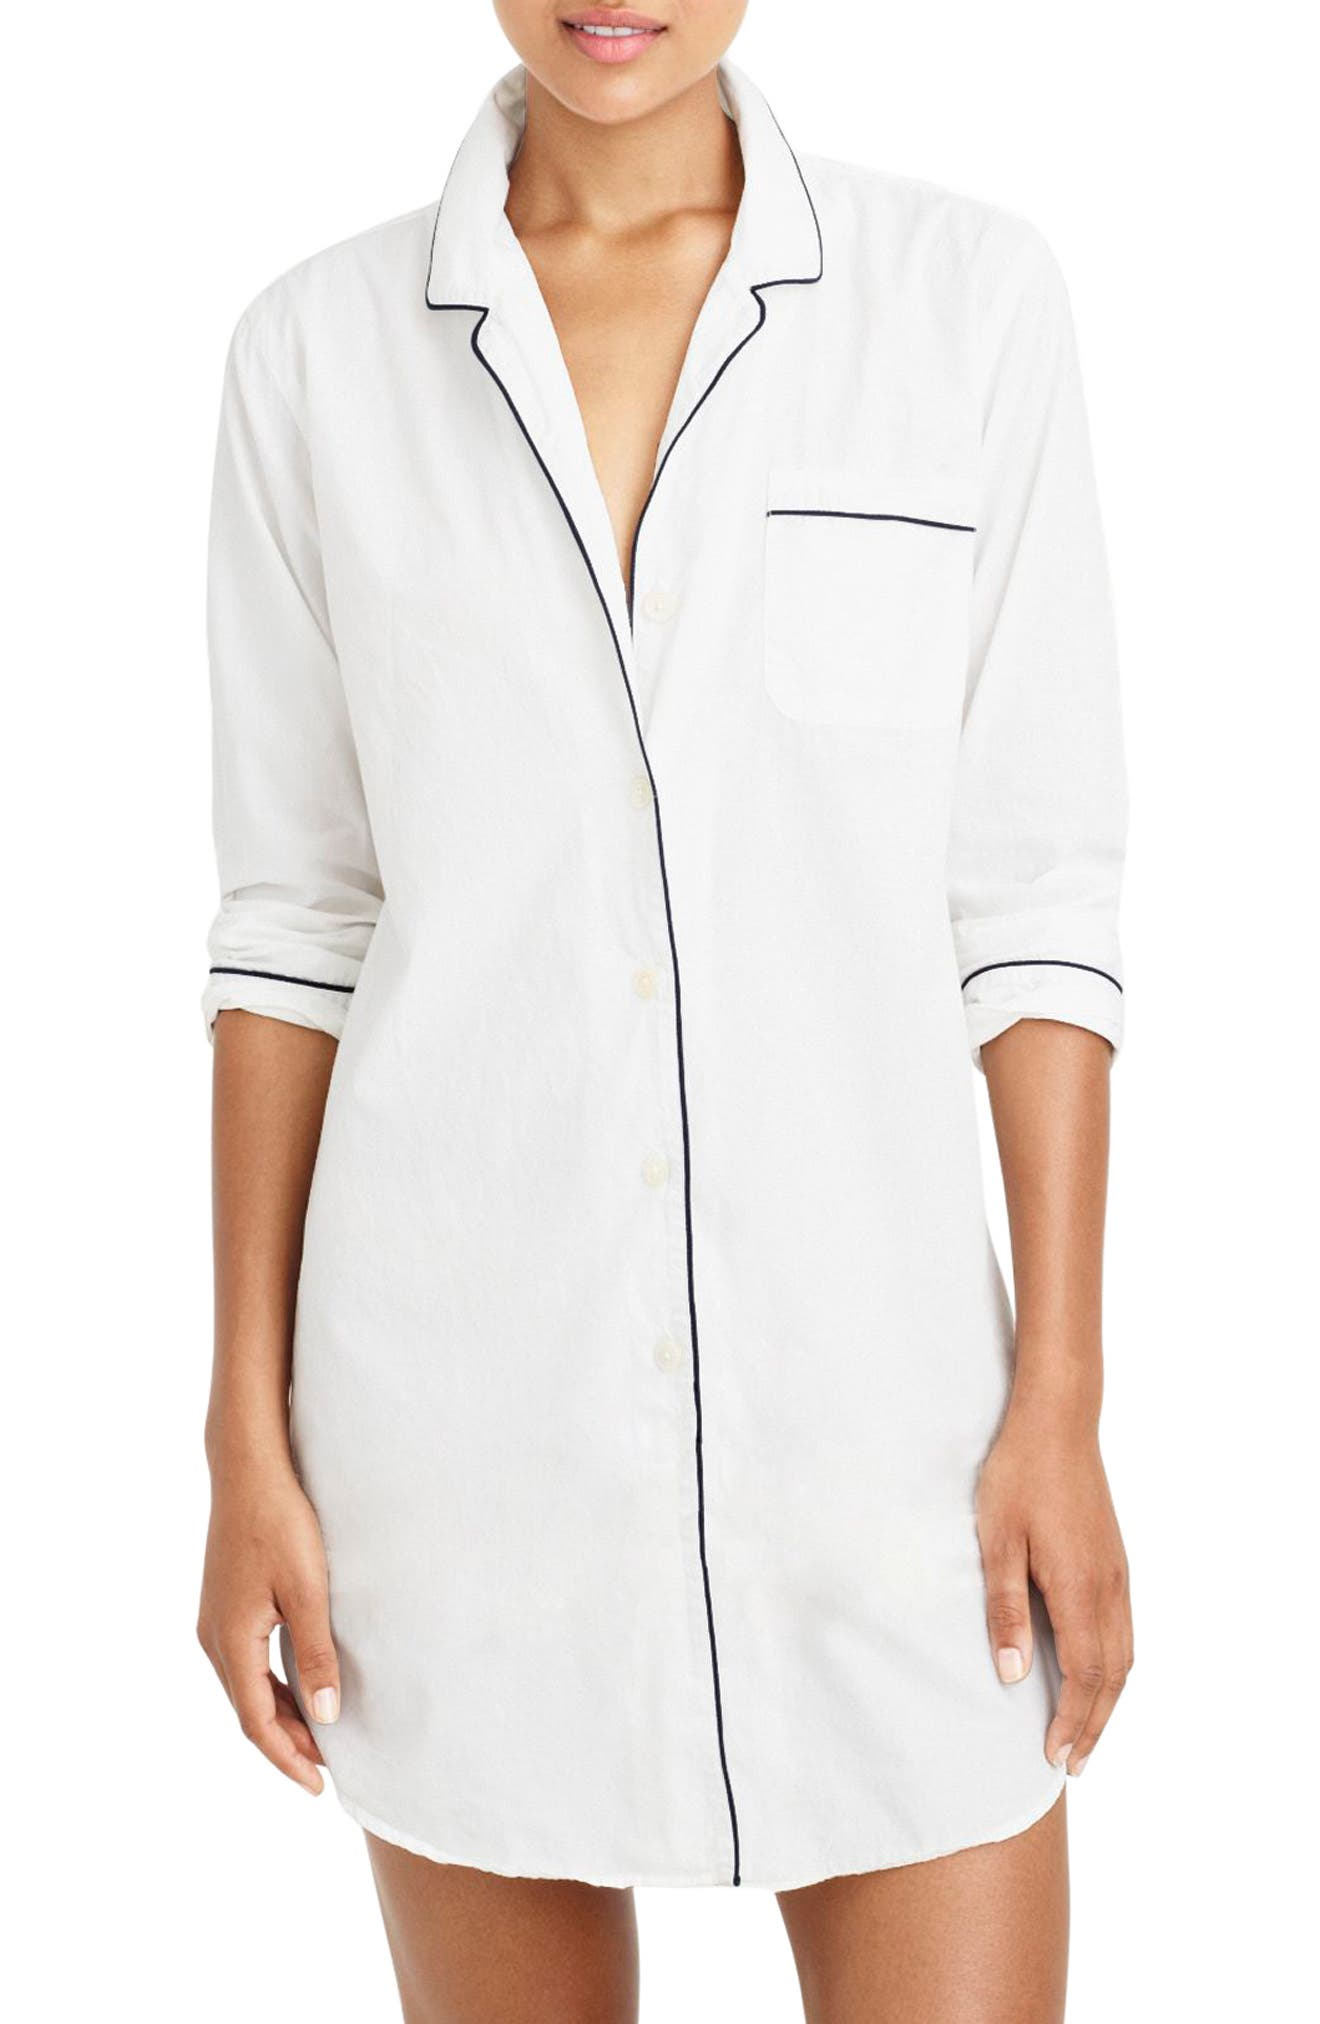 End on End Sleep Shirt,                         Main,                         color, White